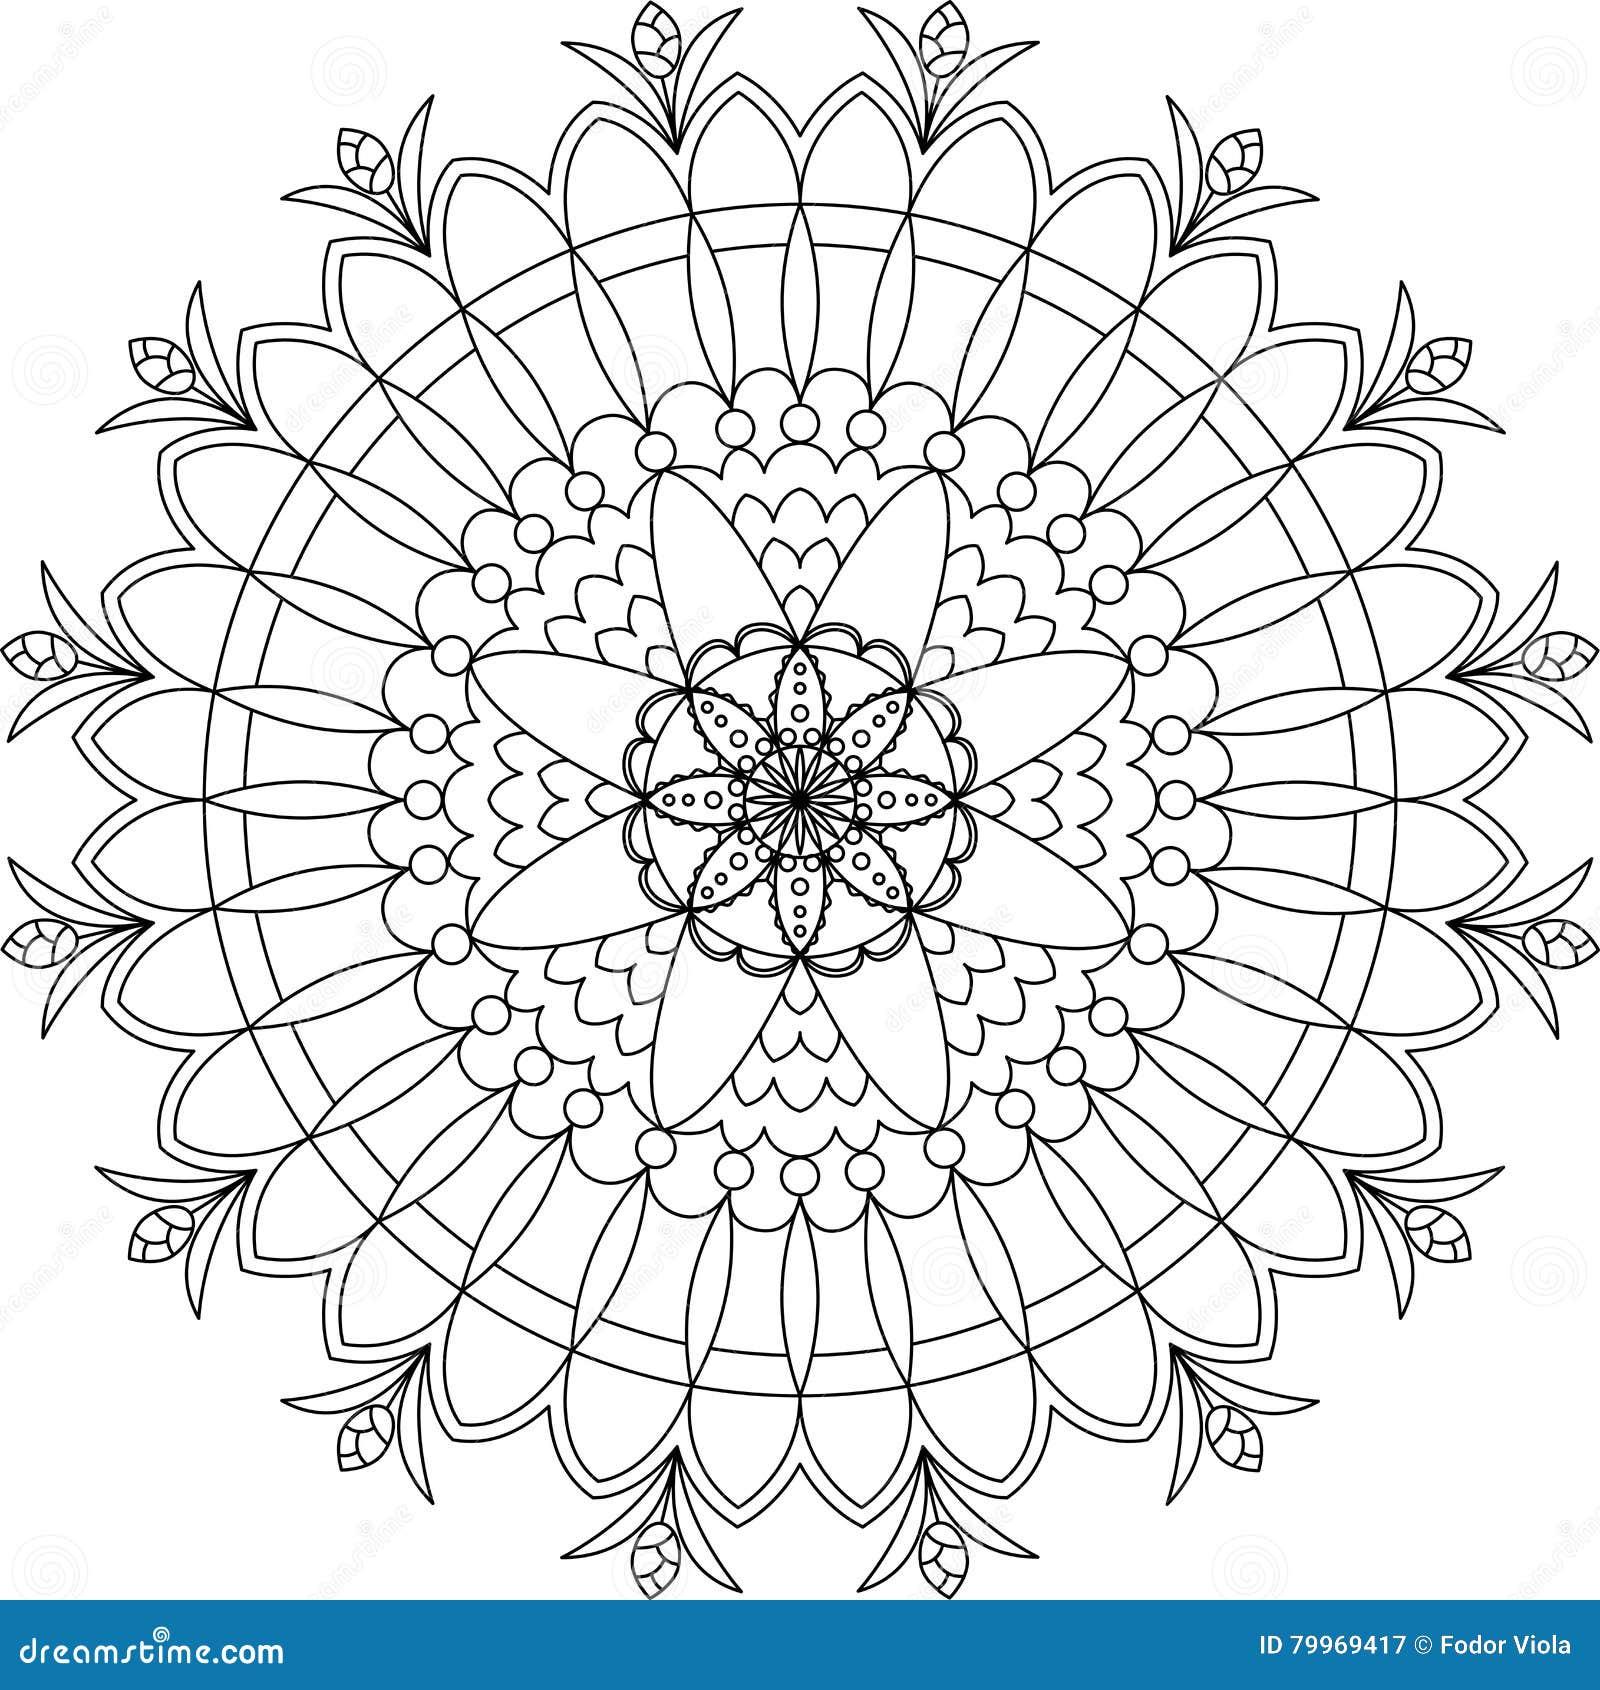 Zentangle Adult Coloring Page Mandala Stock Vector Illustration